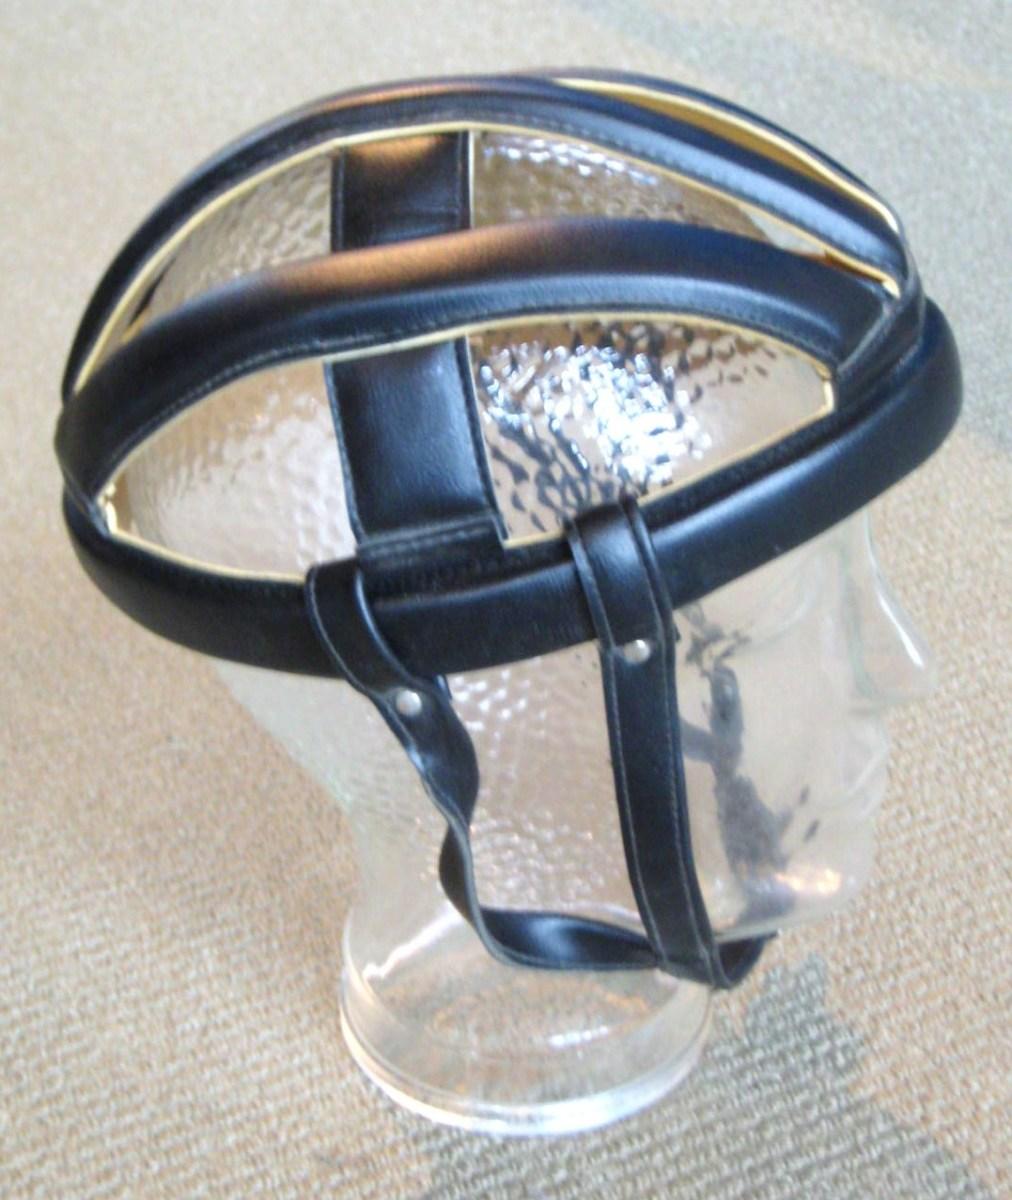 stylish-womens-cycling-helmets